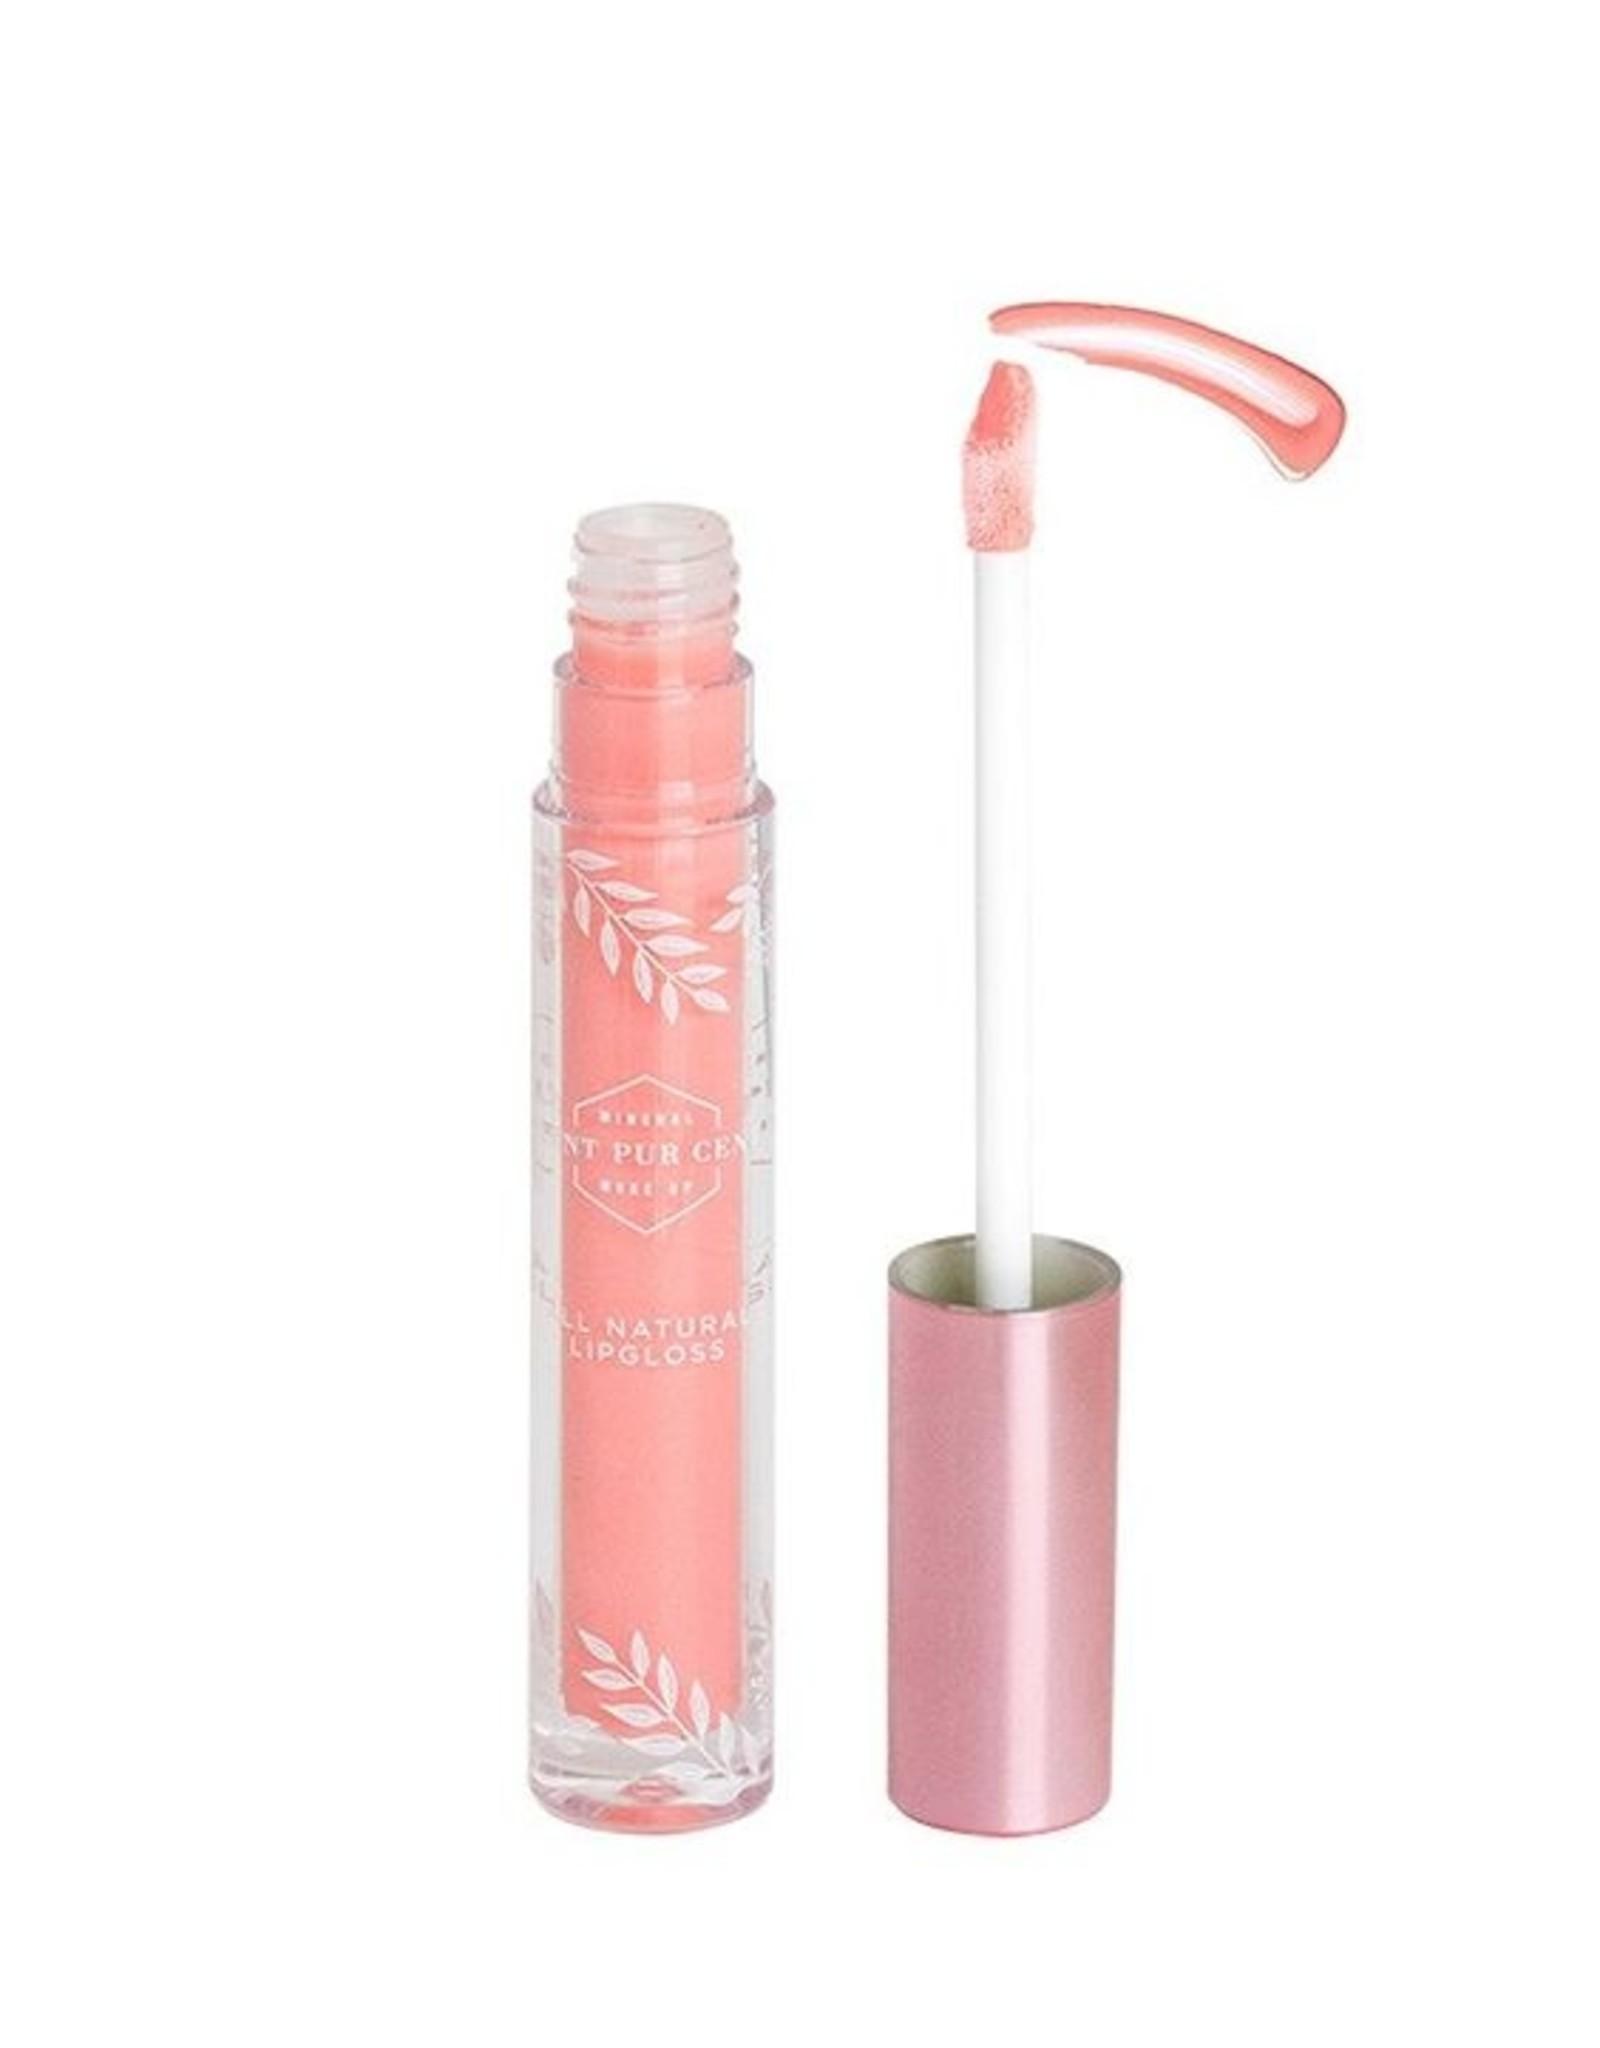 CentpurCent CentpurCent - Mineral Lipgloss BonBon